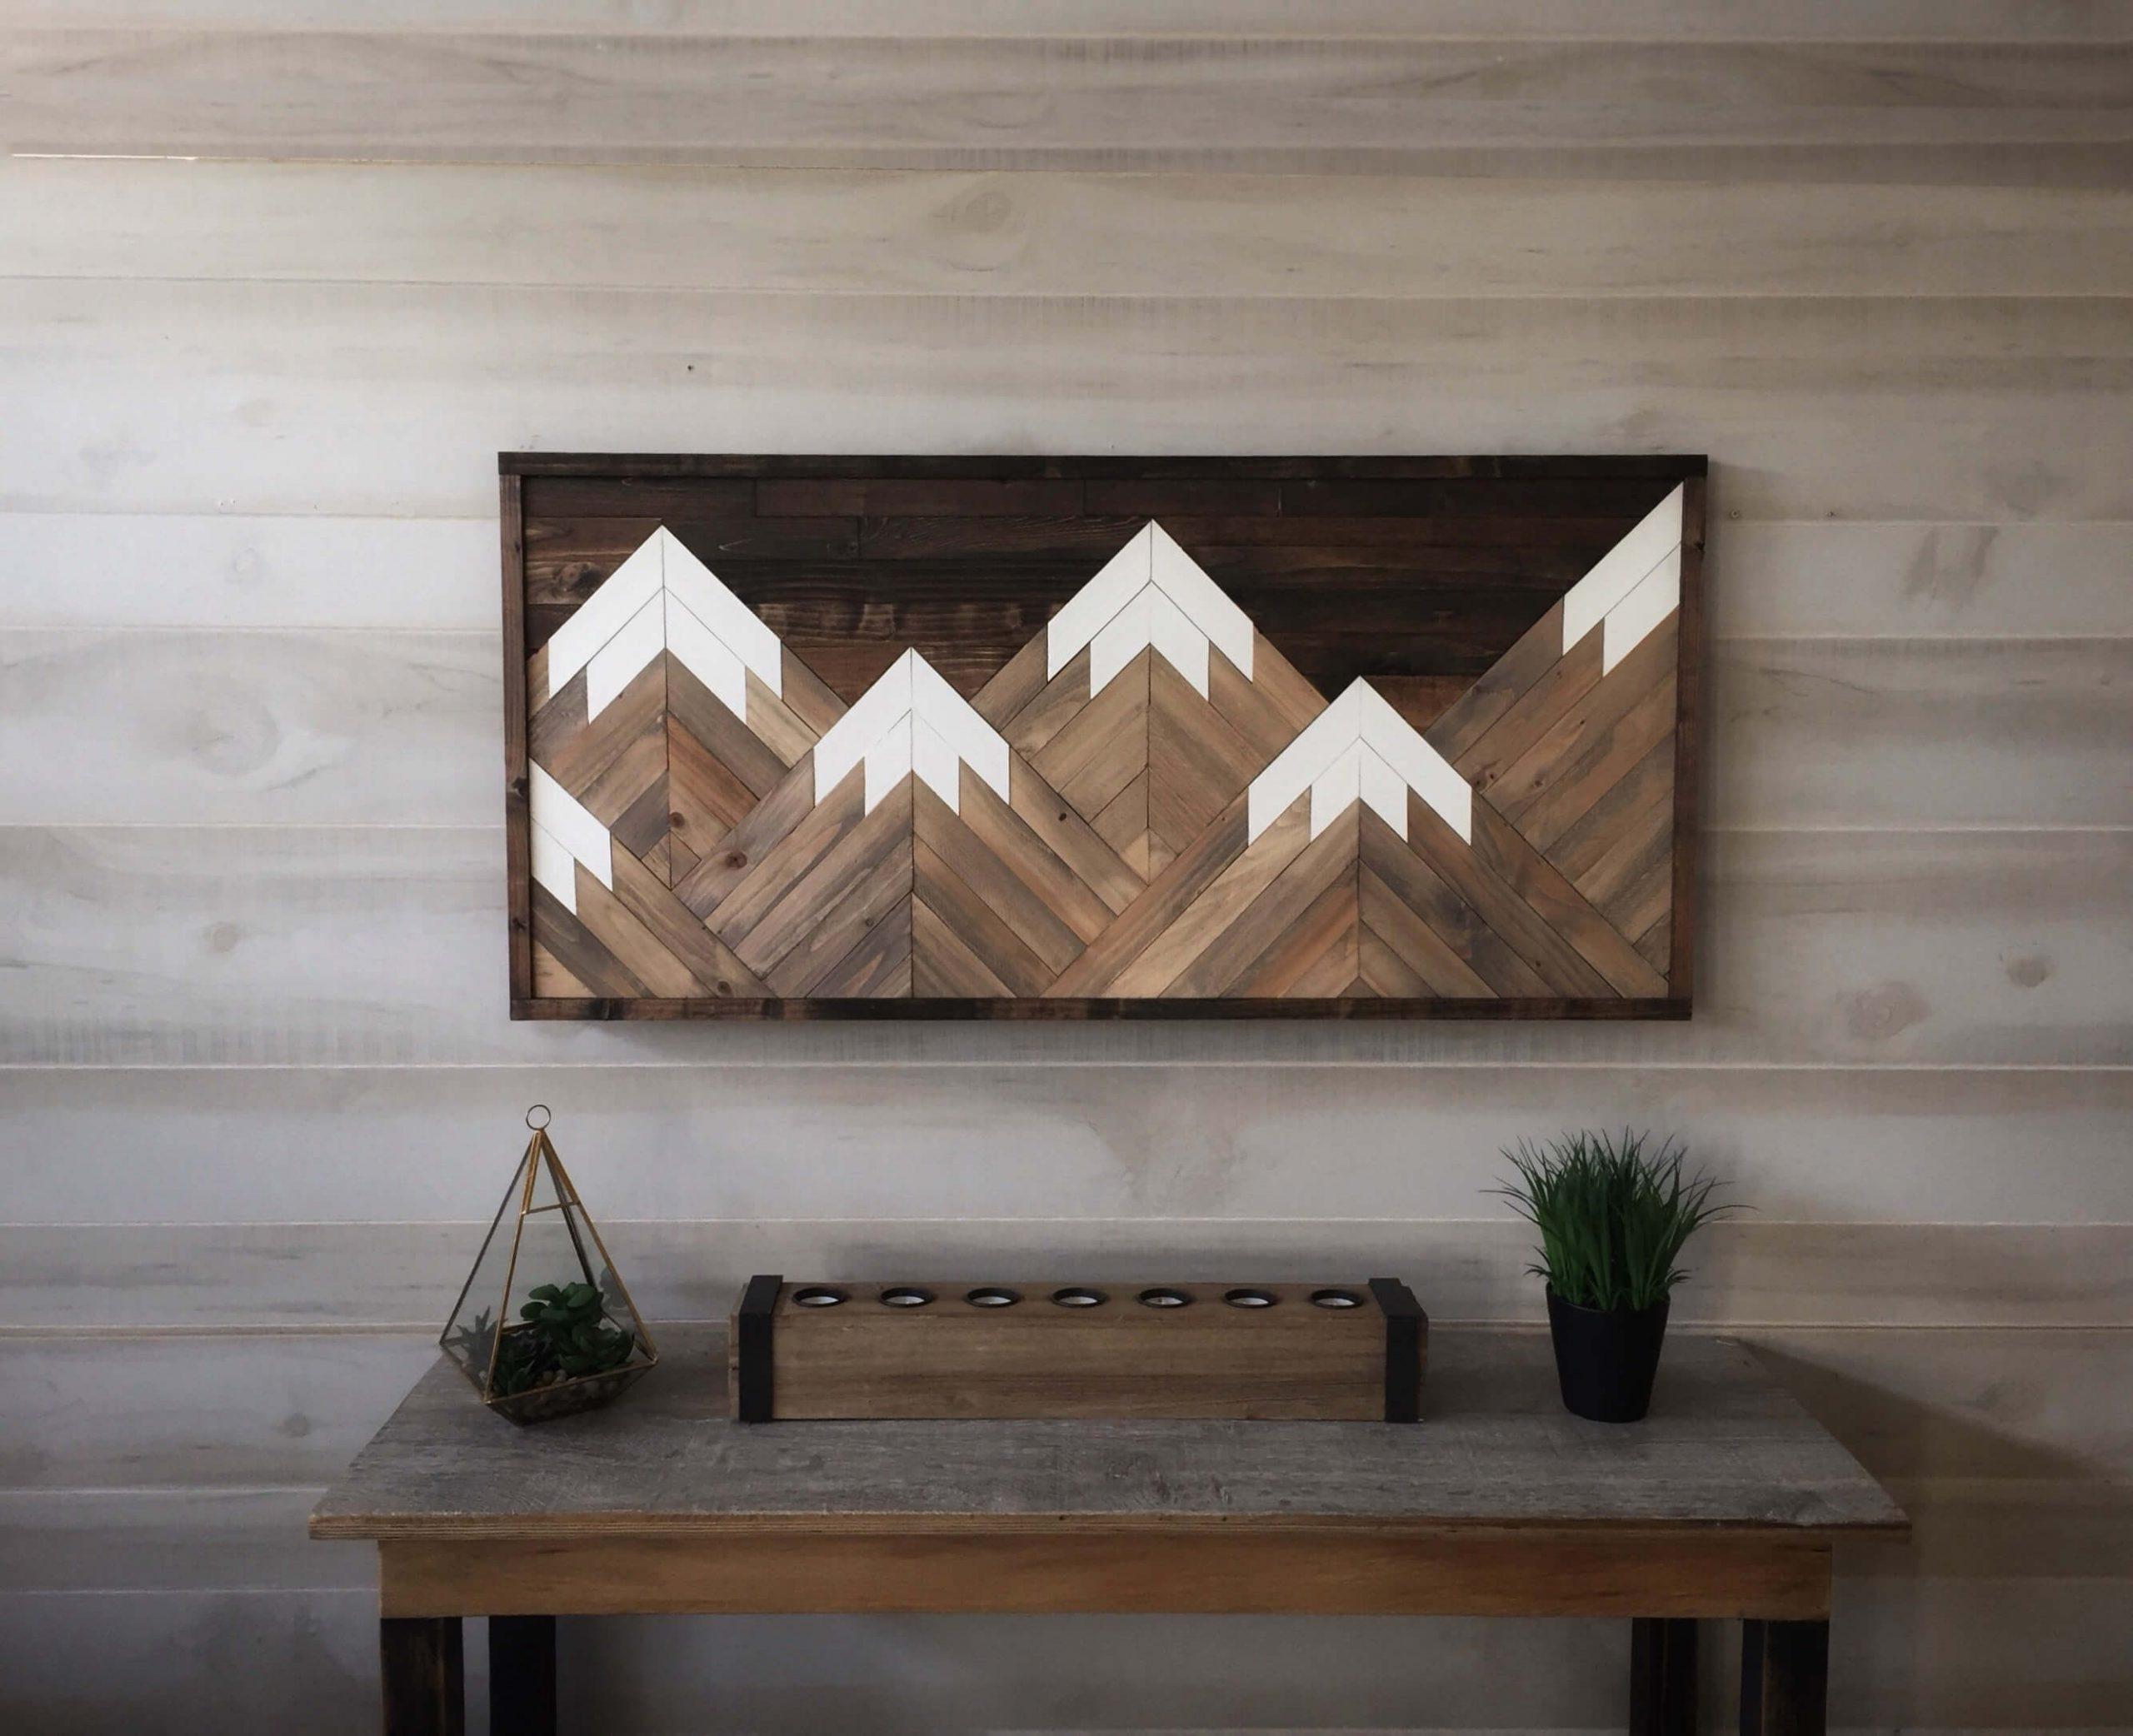 Mountain Range Reclaimed Wood Wall Art